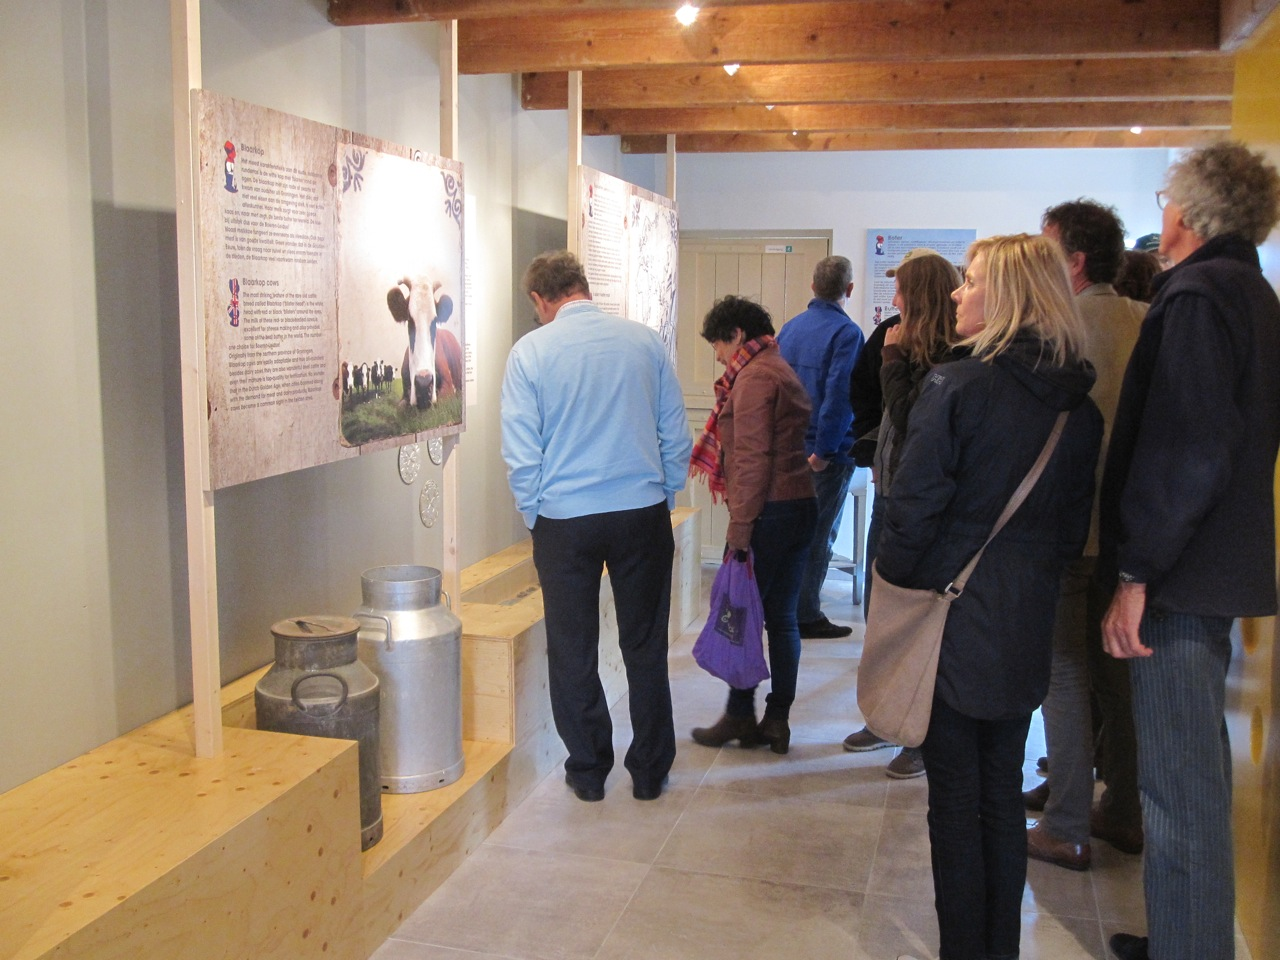 inrichting museum opening tentoonstelling